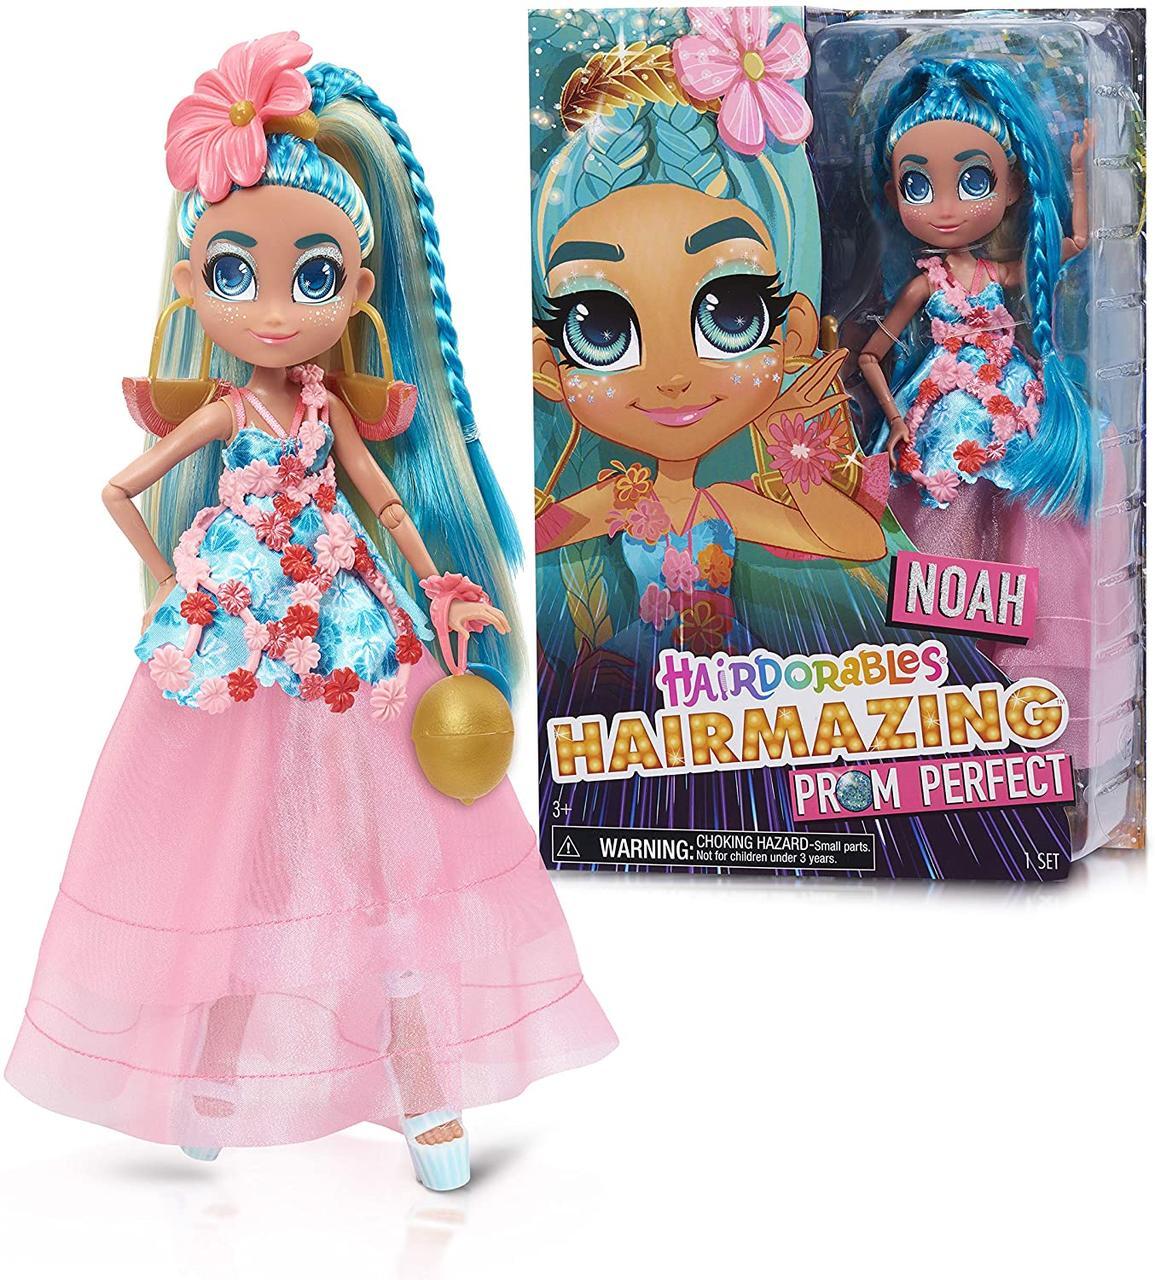 Кукла Хэрдораблс Ноа Выпускной вечер Оригинал! Hairdorables Hairmazing Prom Perfect Noah